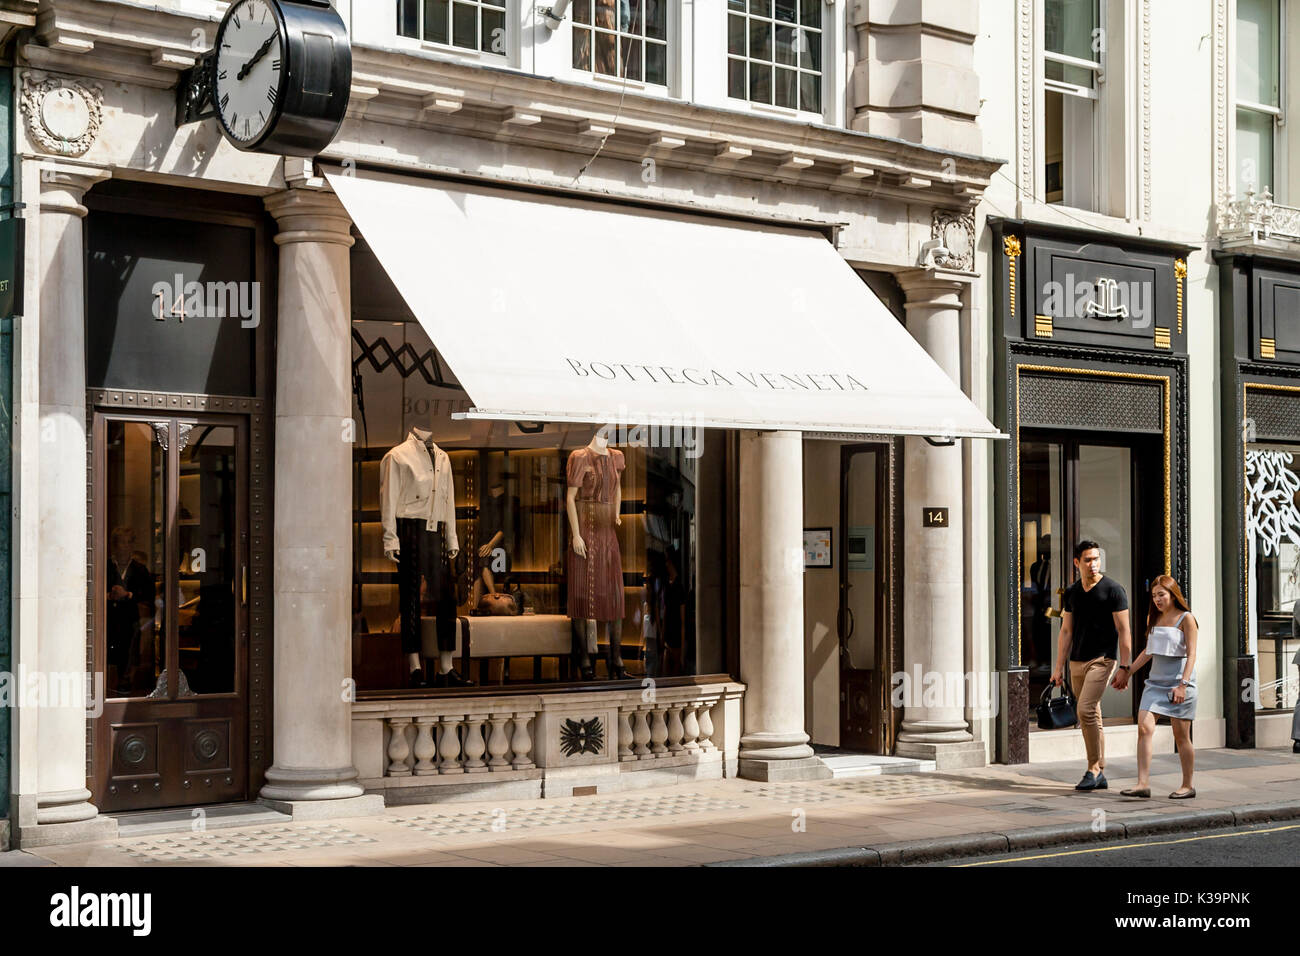 The Exterior Of Bottega Veneta Leather Goods And Fashion Store Old Bond Street London UK